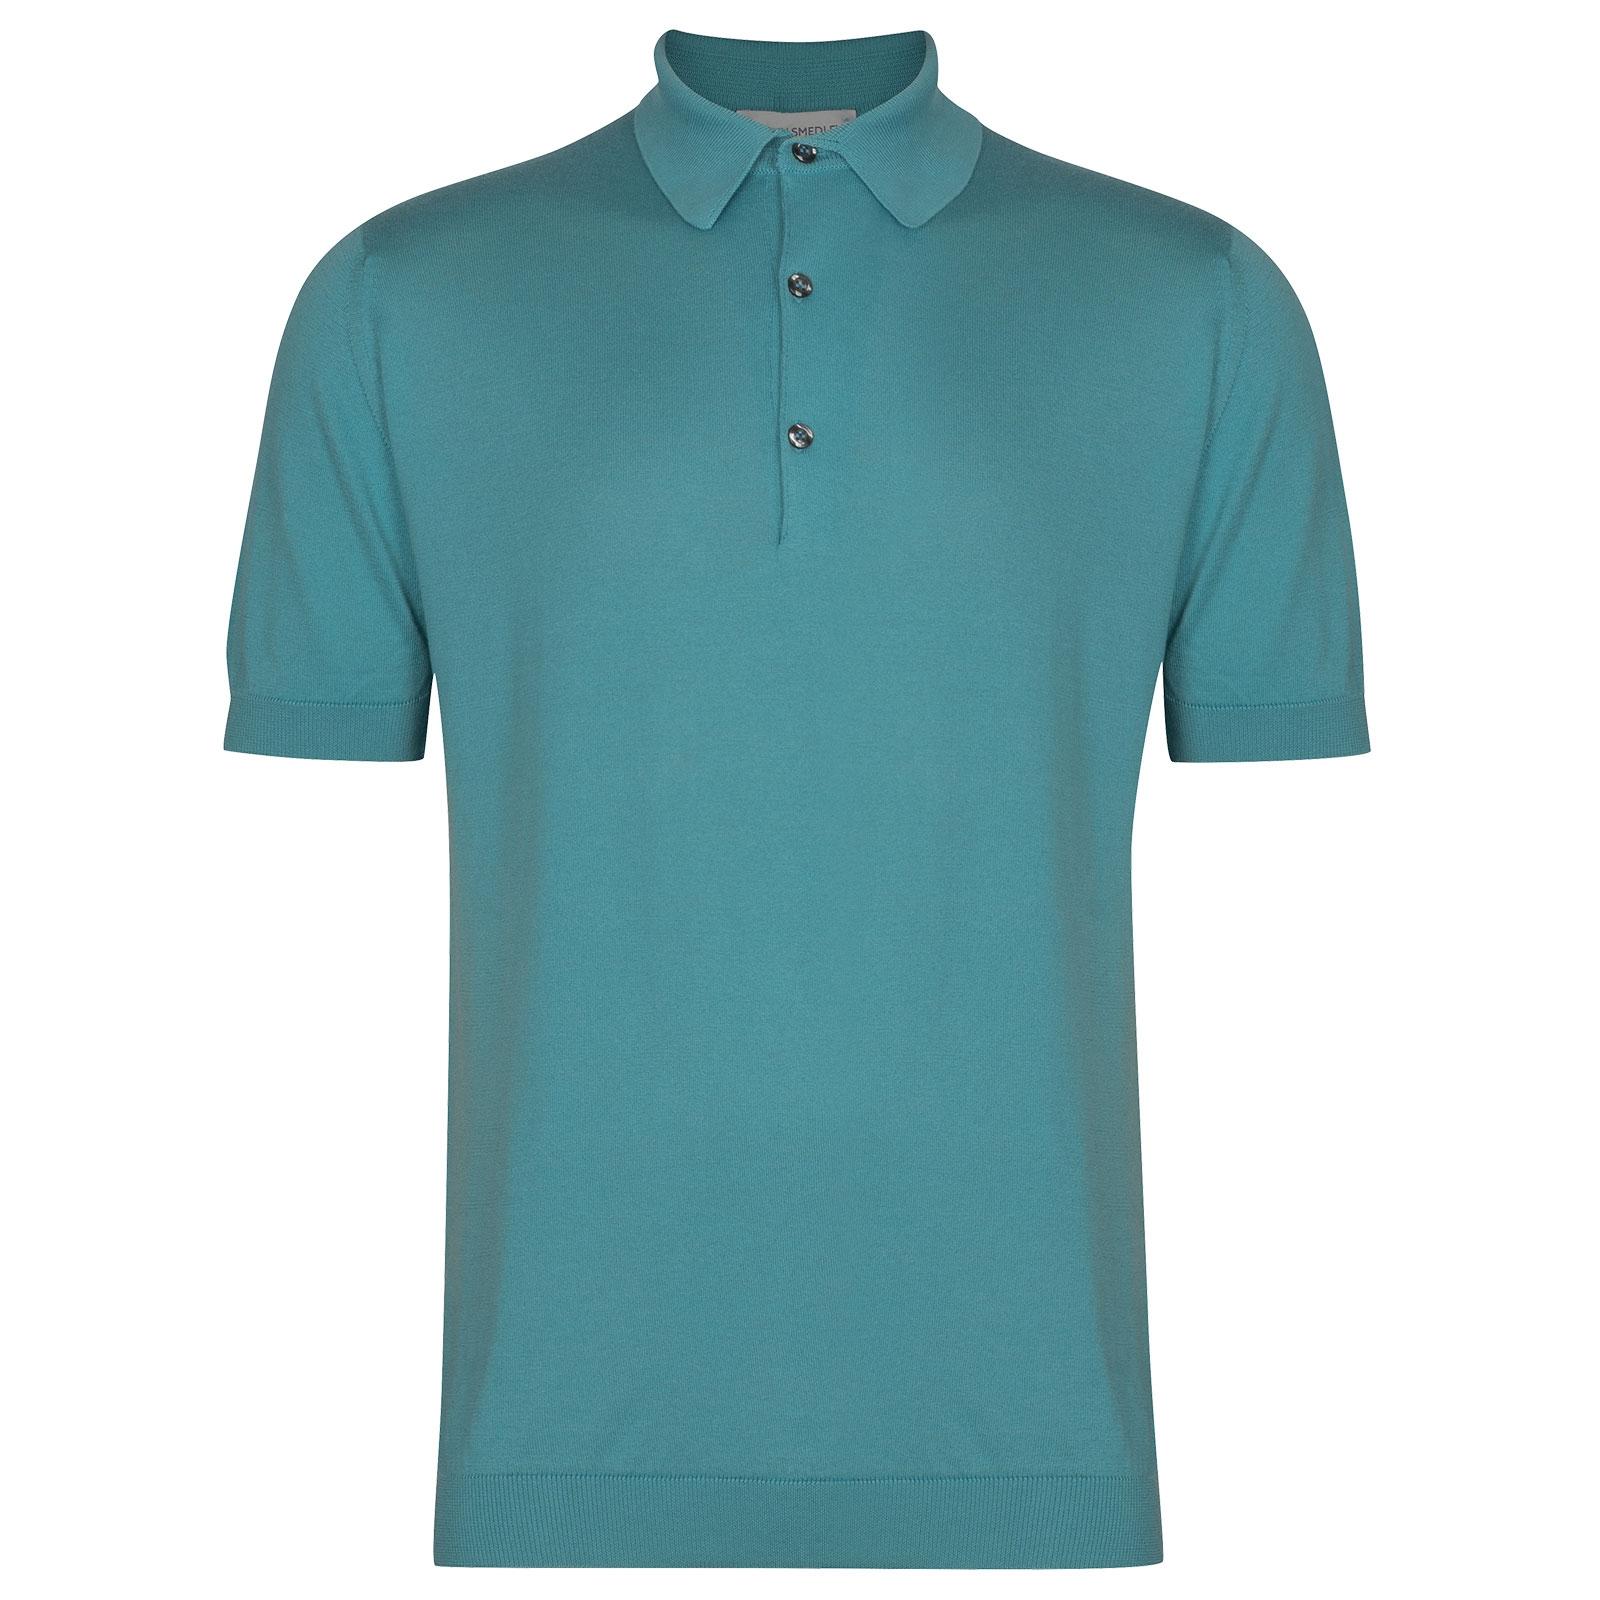 John Smedley Adrian in Empyrean Blue Shirt-XLG